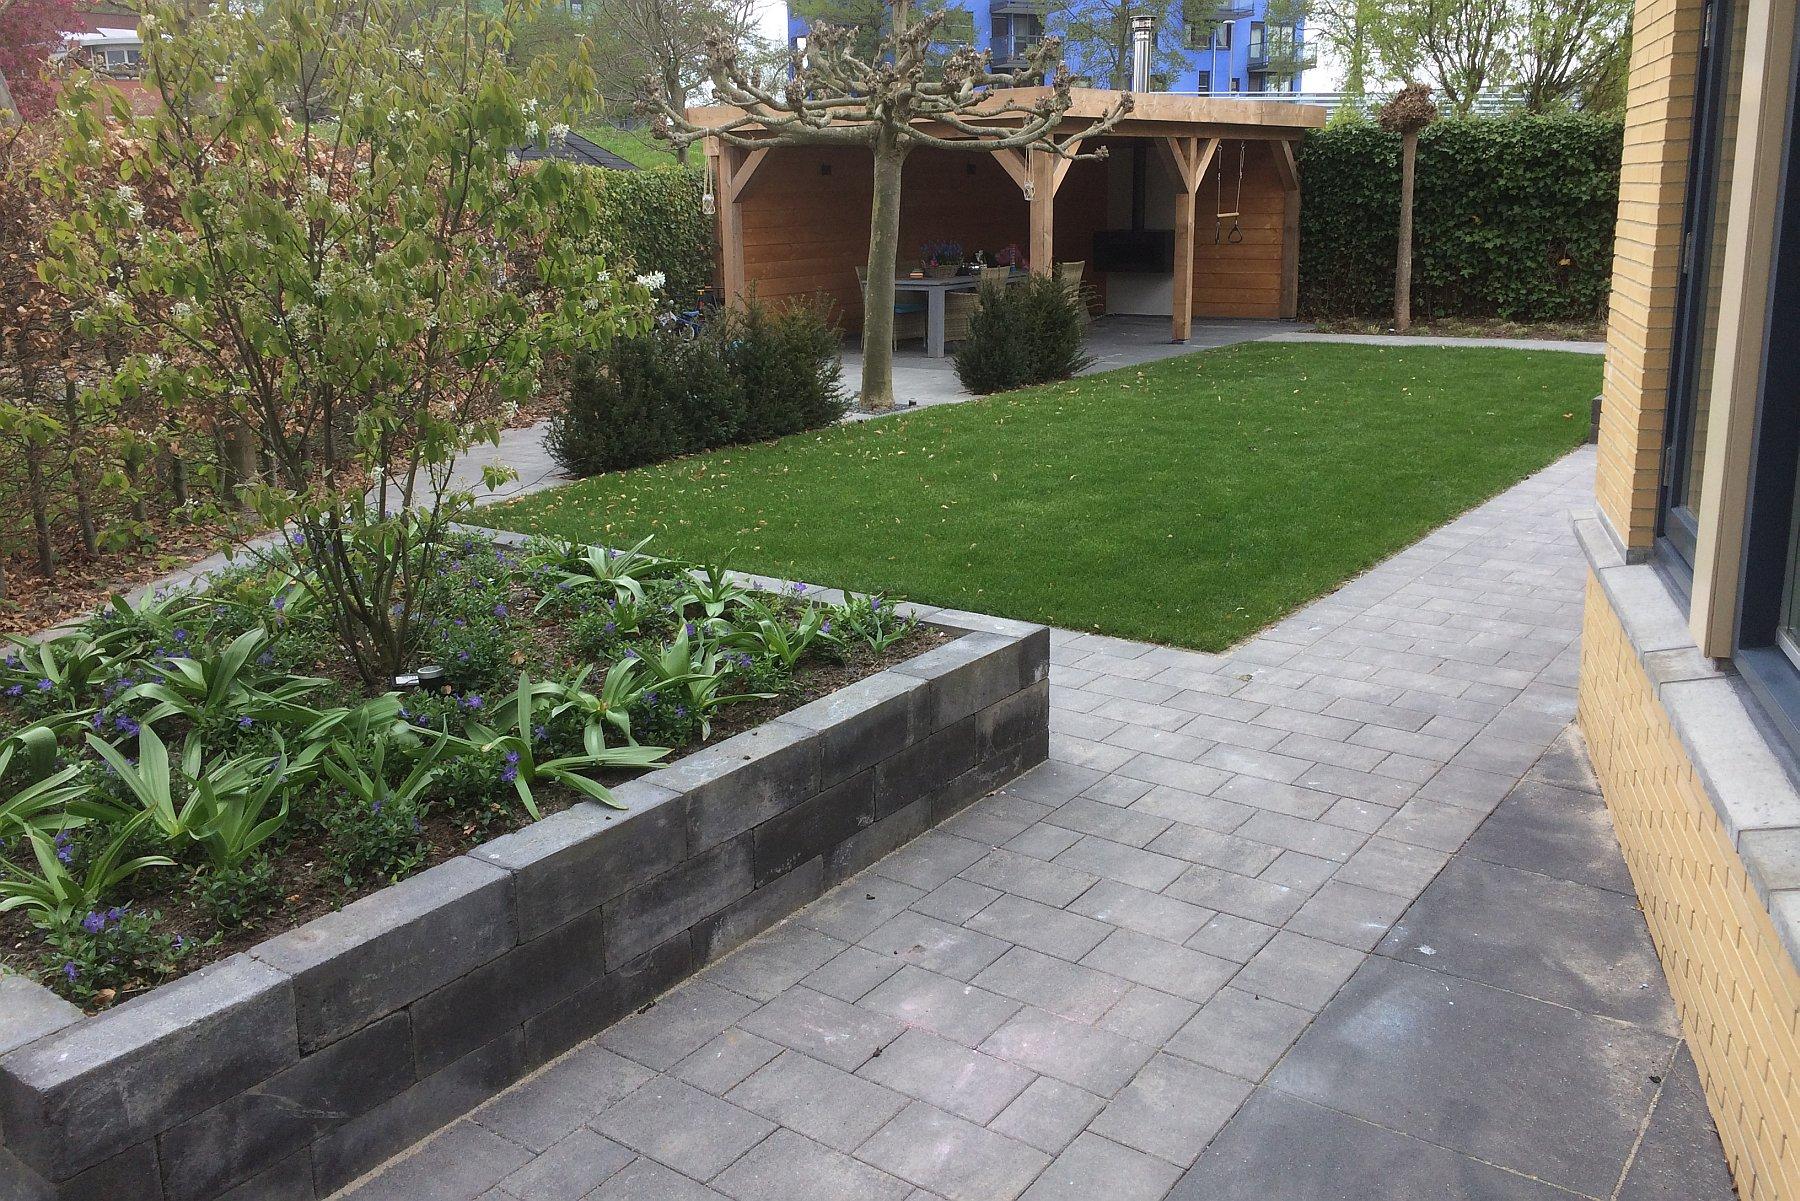 Aanleg tuin westzaan jansen hoveniers markenbinnen l hoveniers